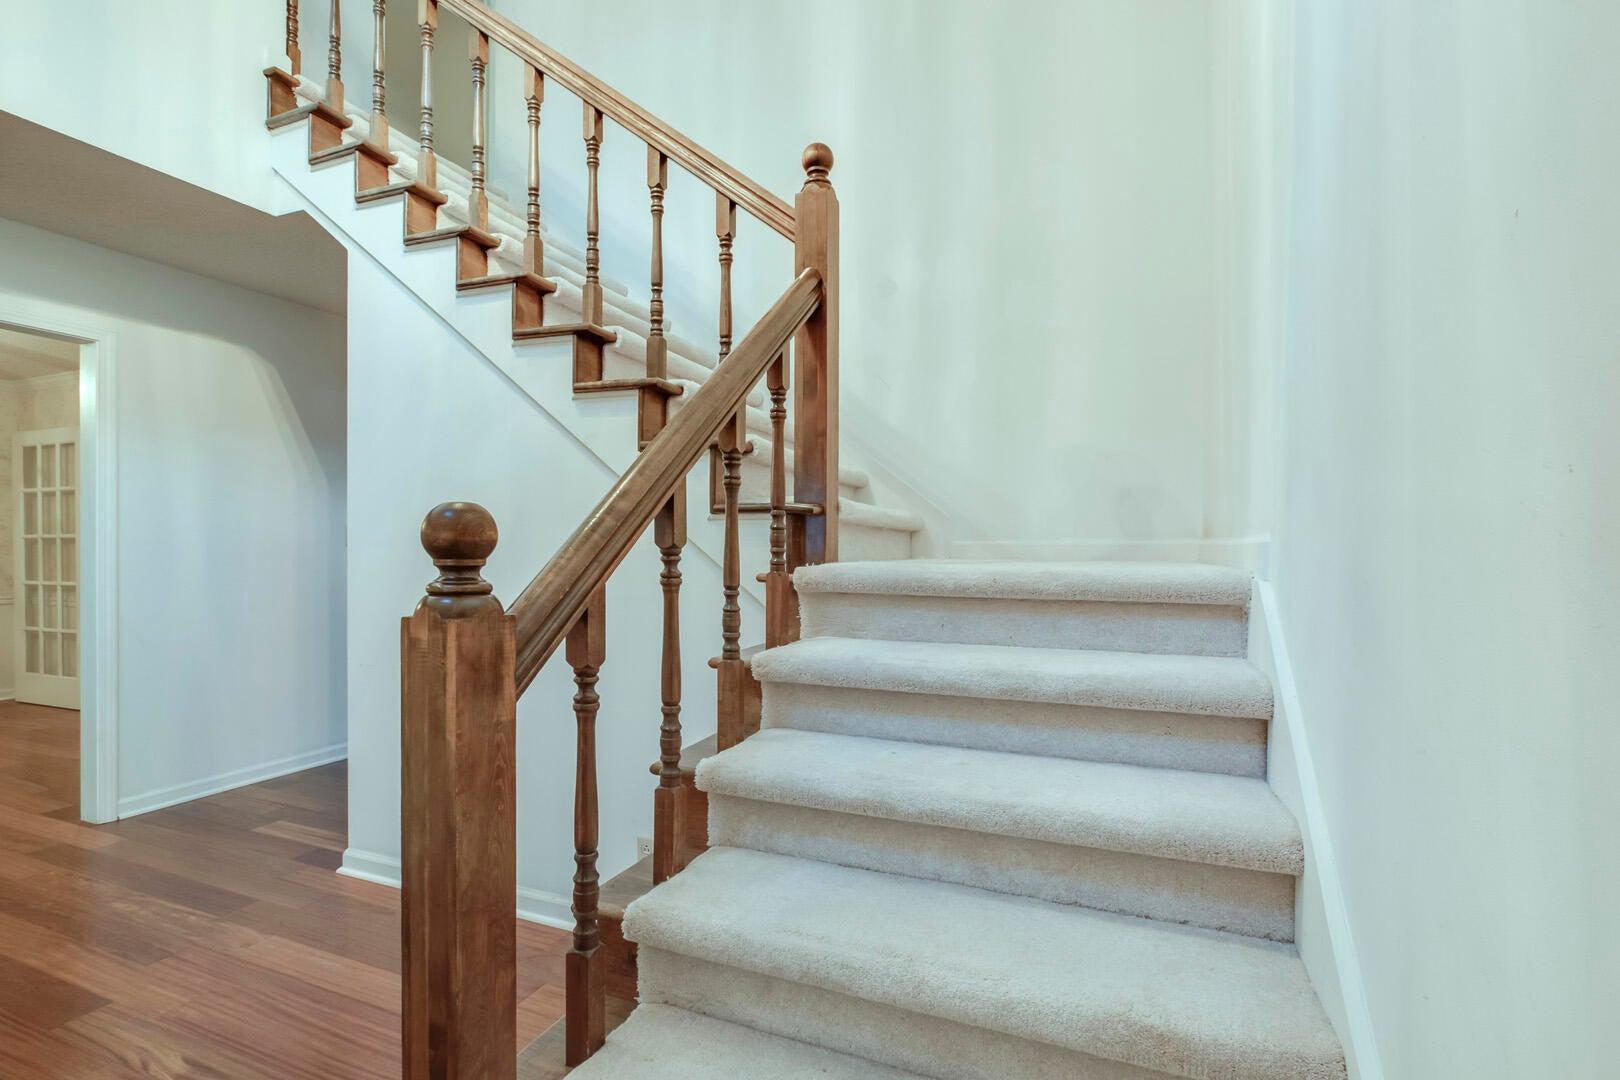 21_NMonticelloDrive_11801_StairsUp